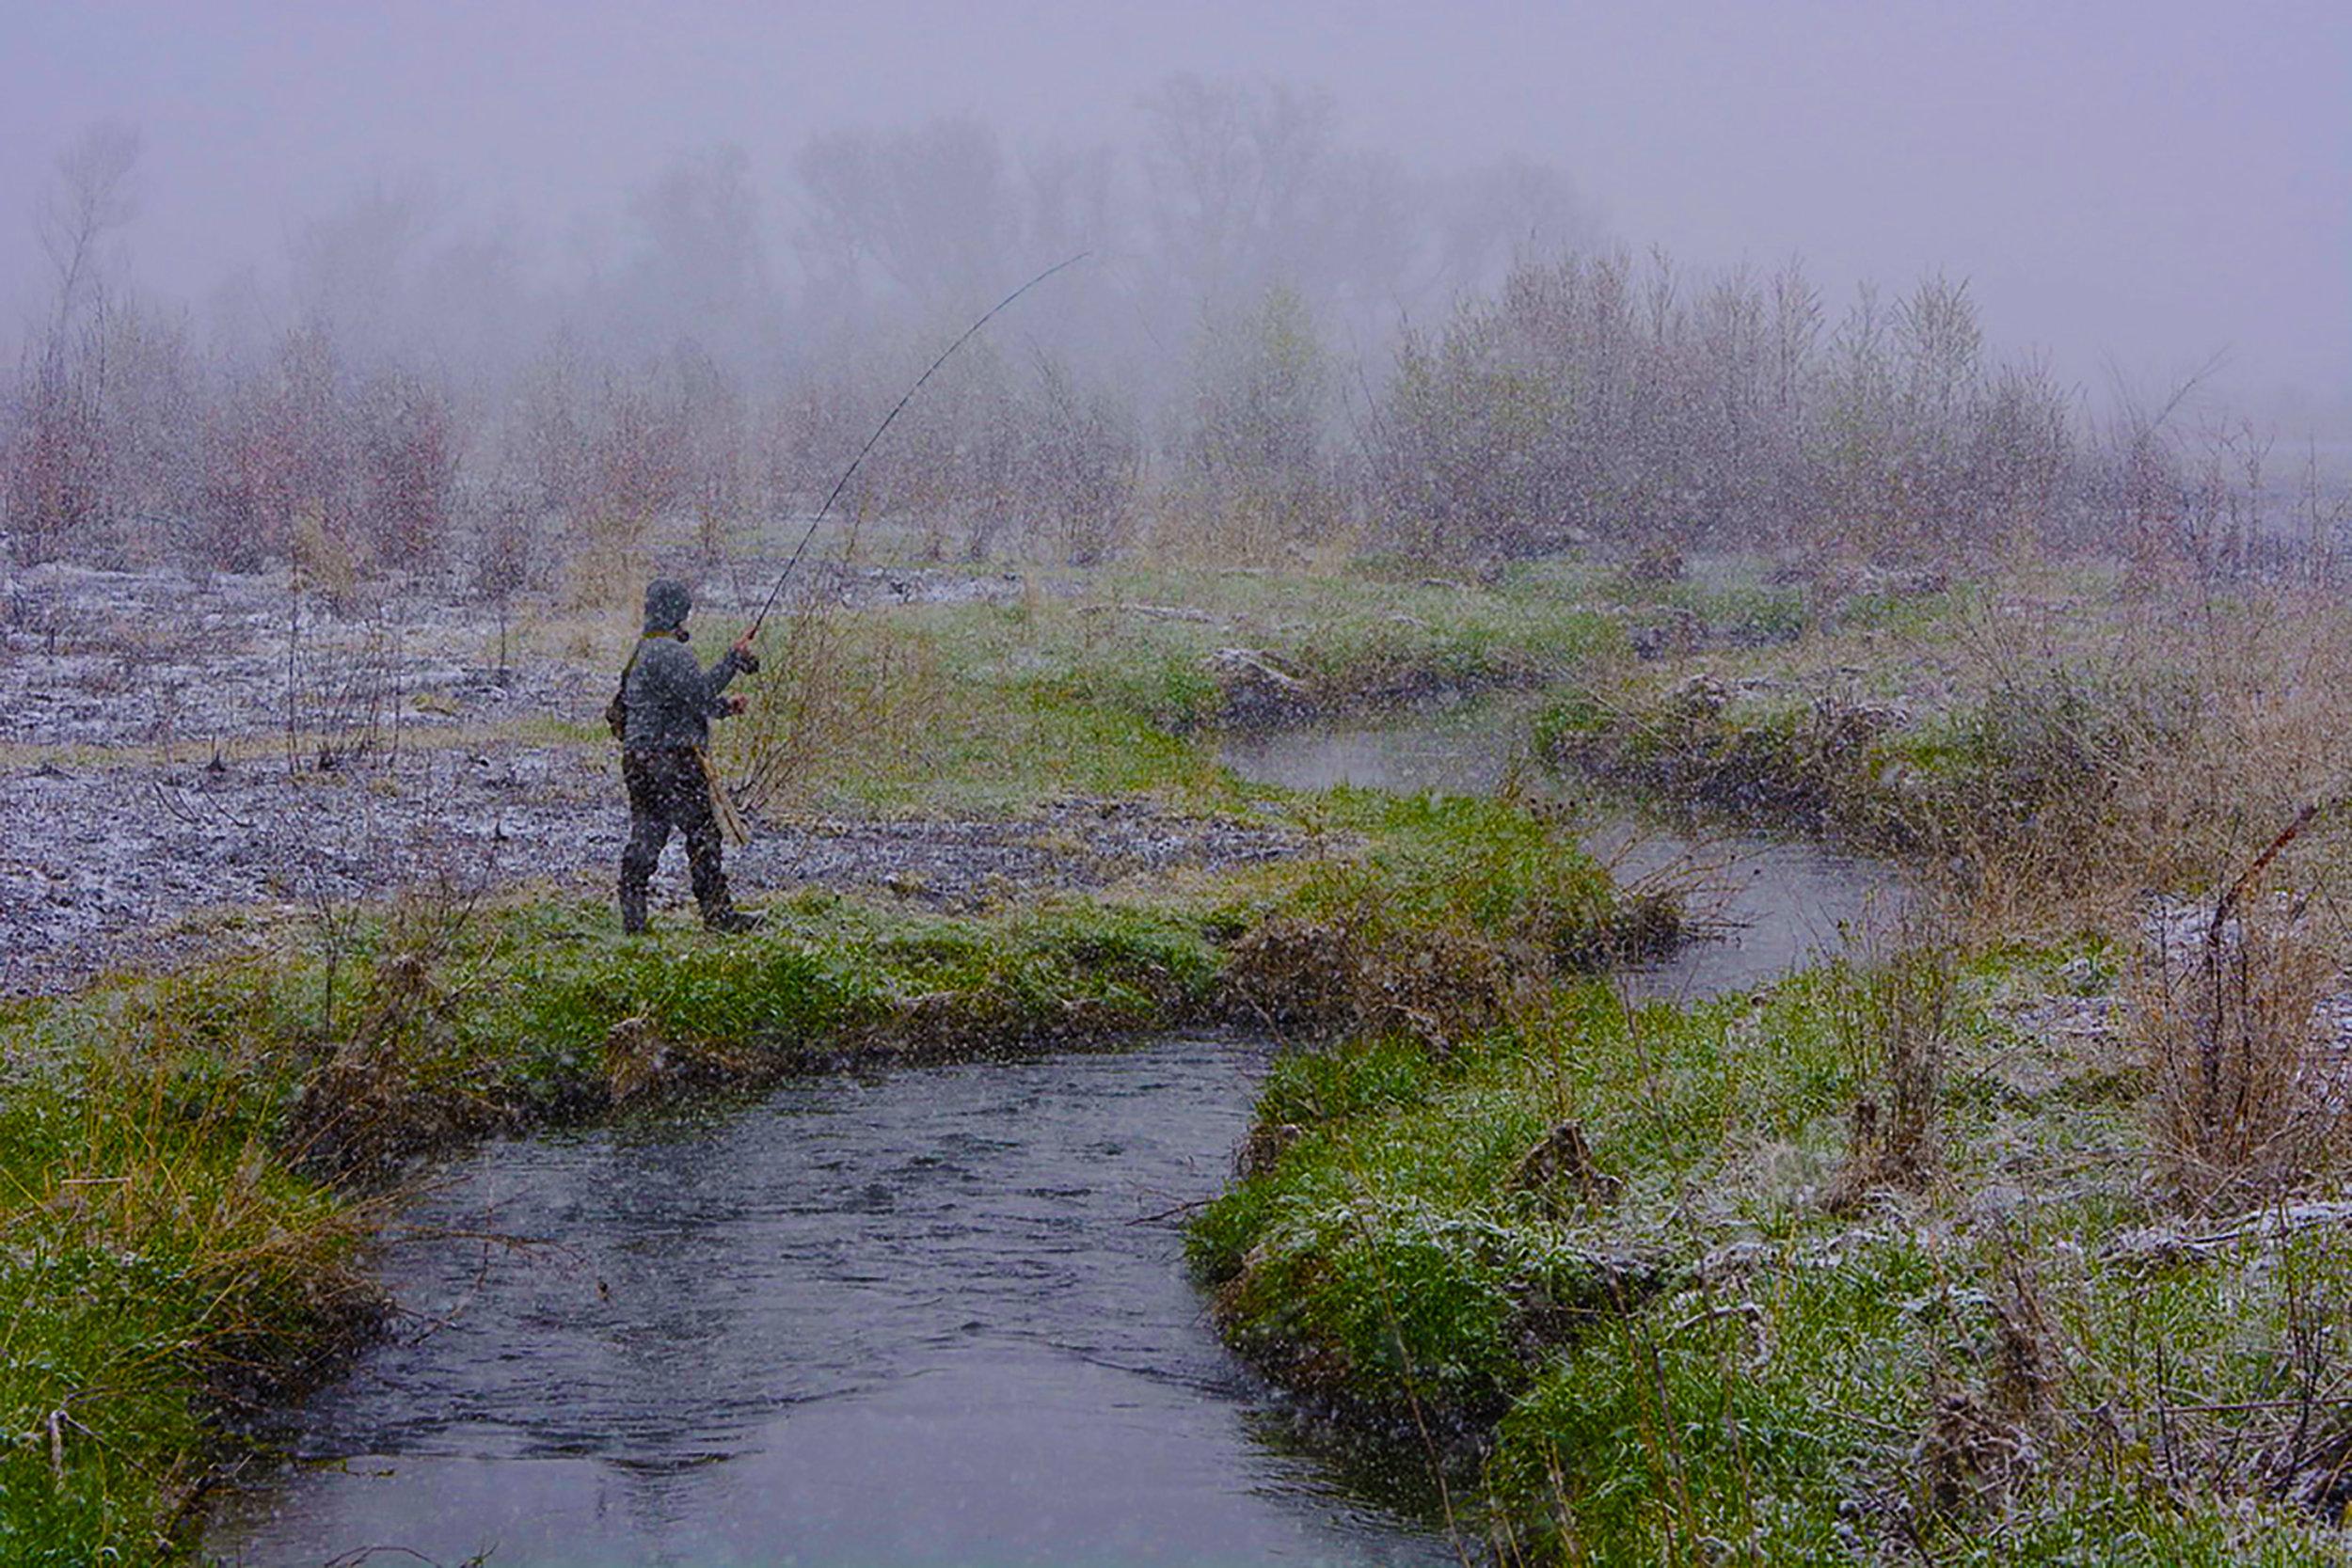 On Vermont Creek April 27